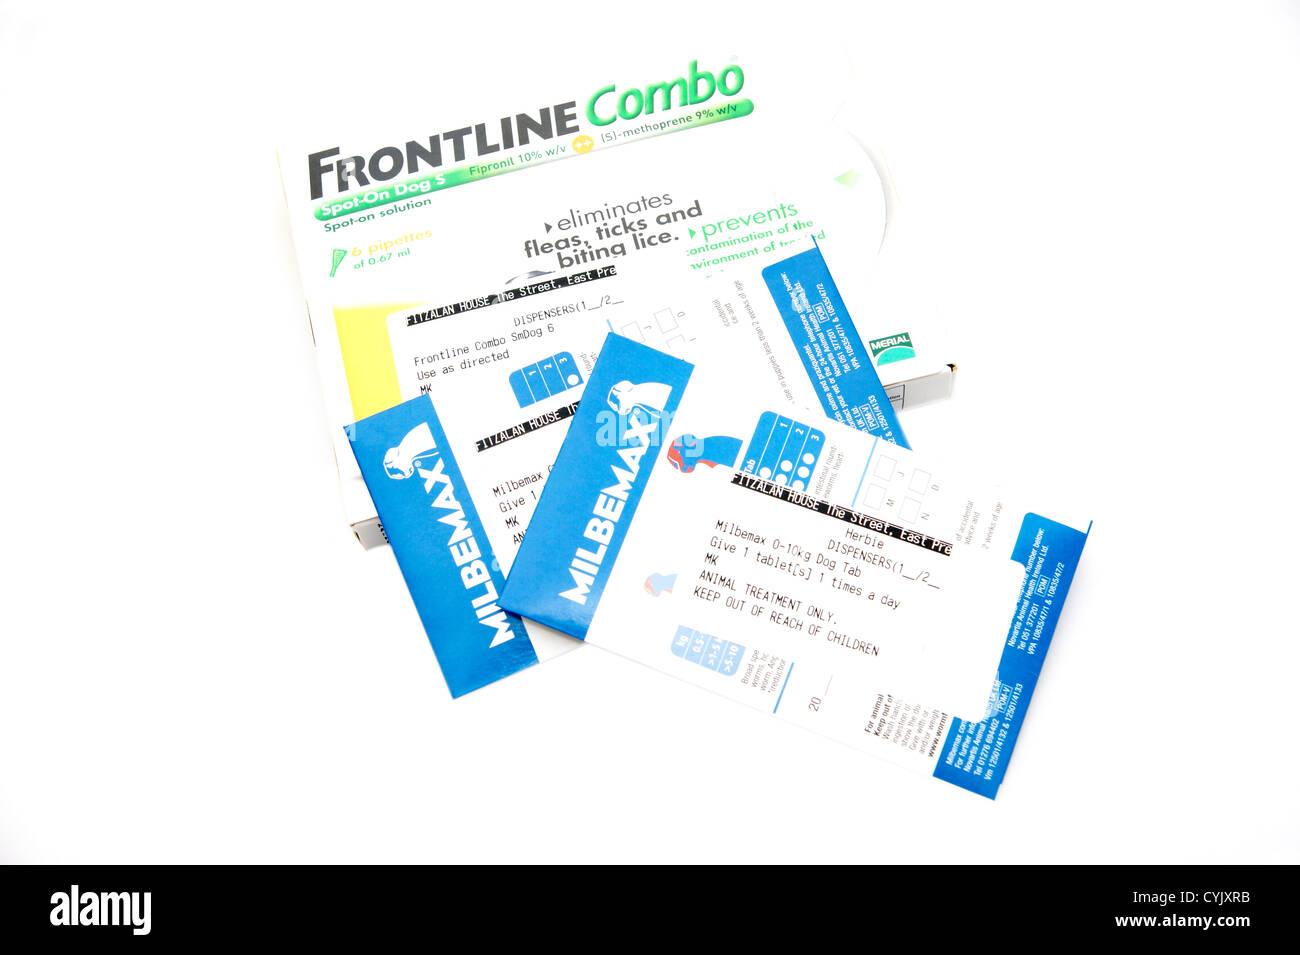 Frontline Pipetten Behandlung verhindert, dass Flöhe Zecken & Insekten & Milbemax Tabletten für Stockbild